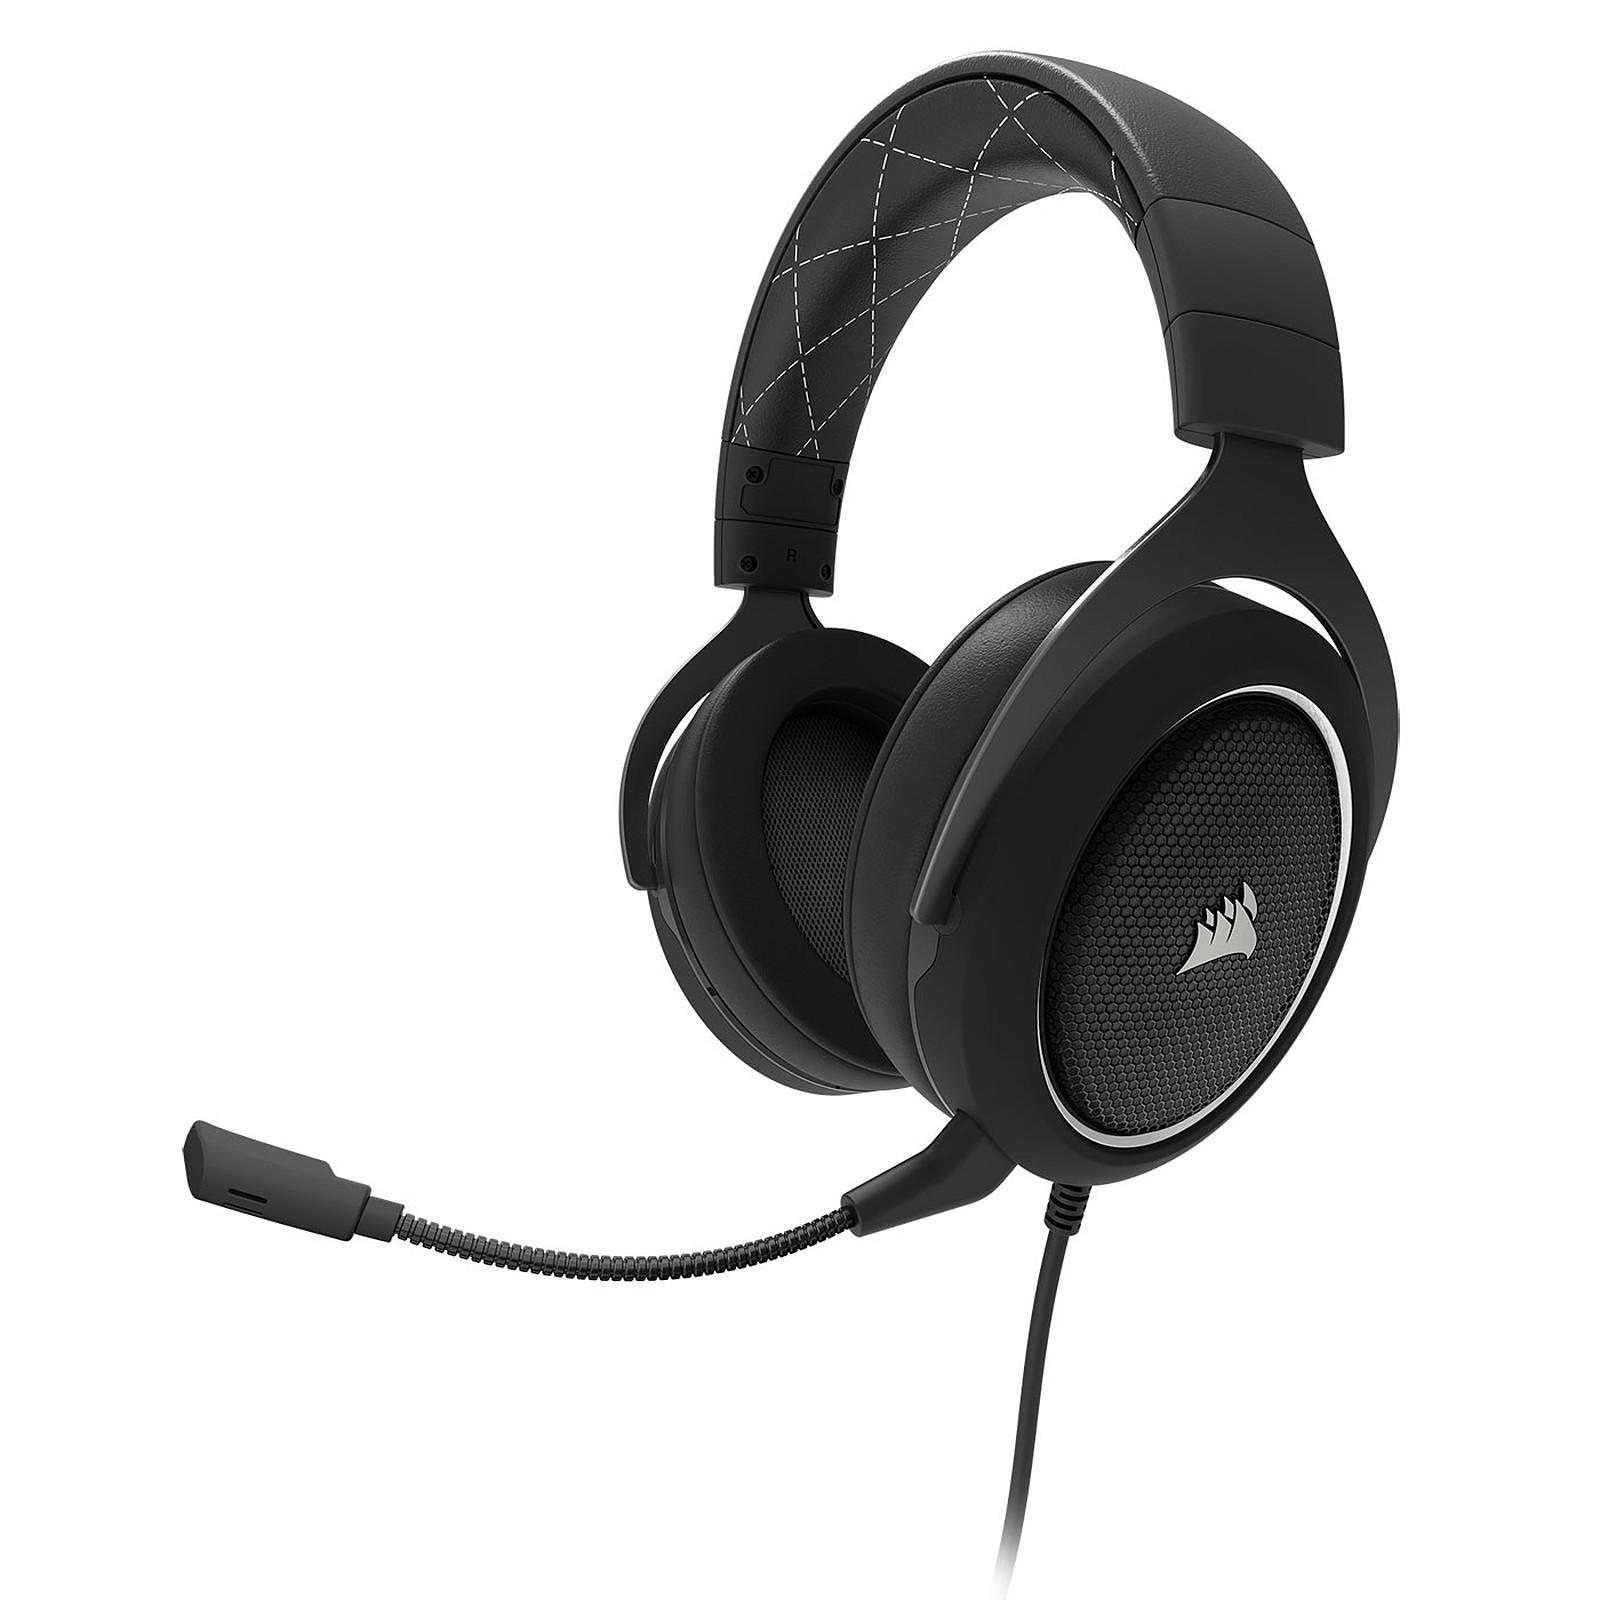 HS60 Surround White (CA-9011174-EU) - Achat / Vente Micro-casque sur Picata.fr - 3